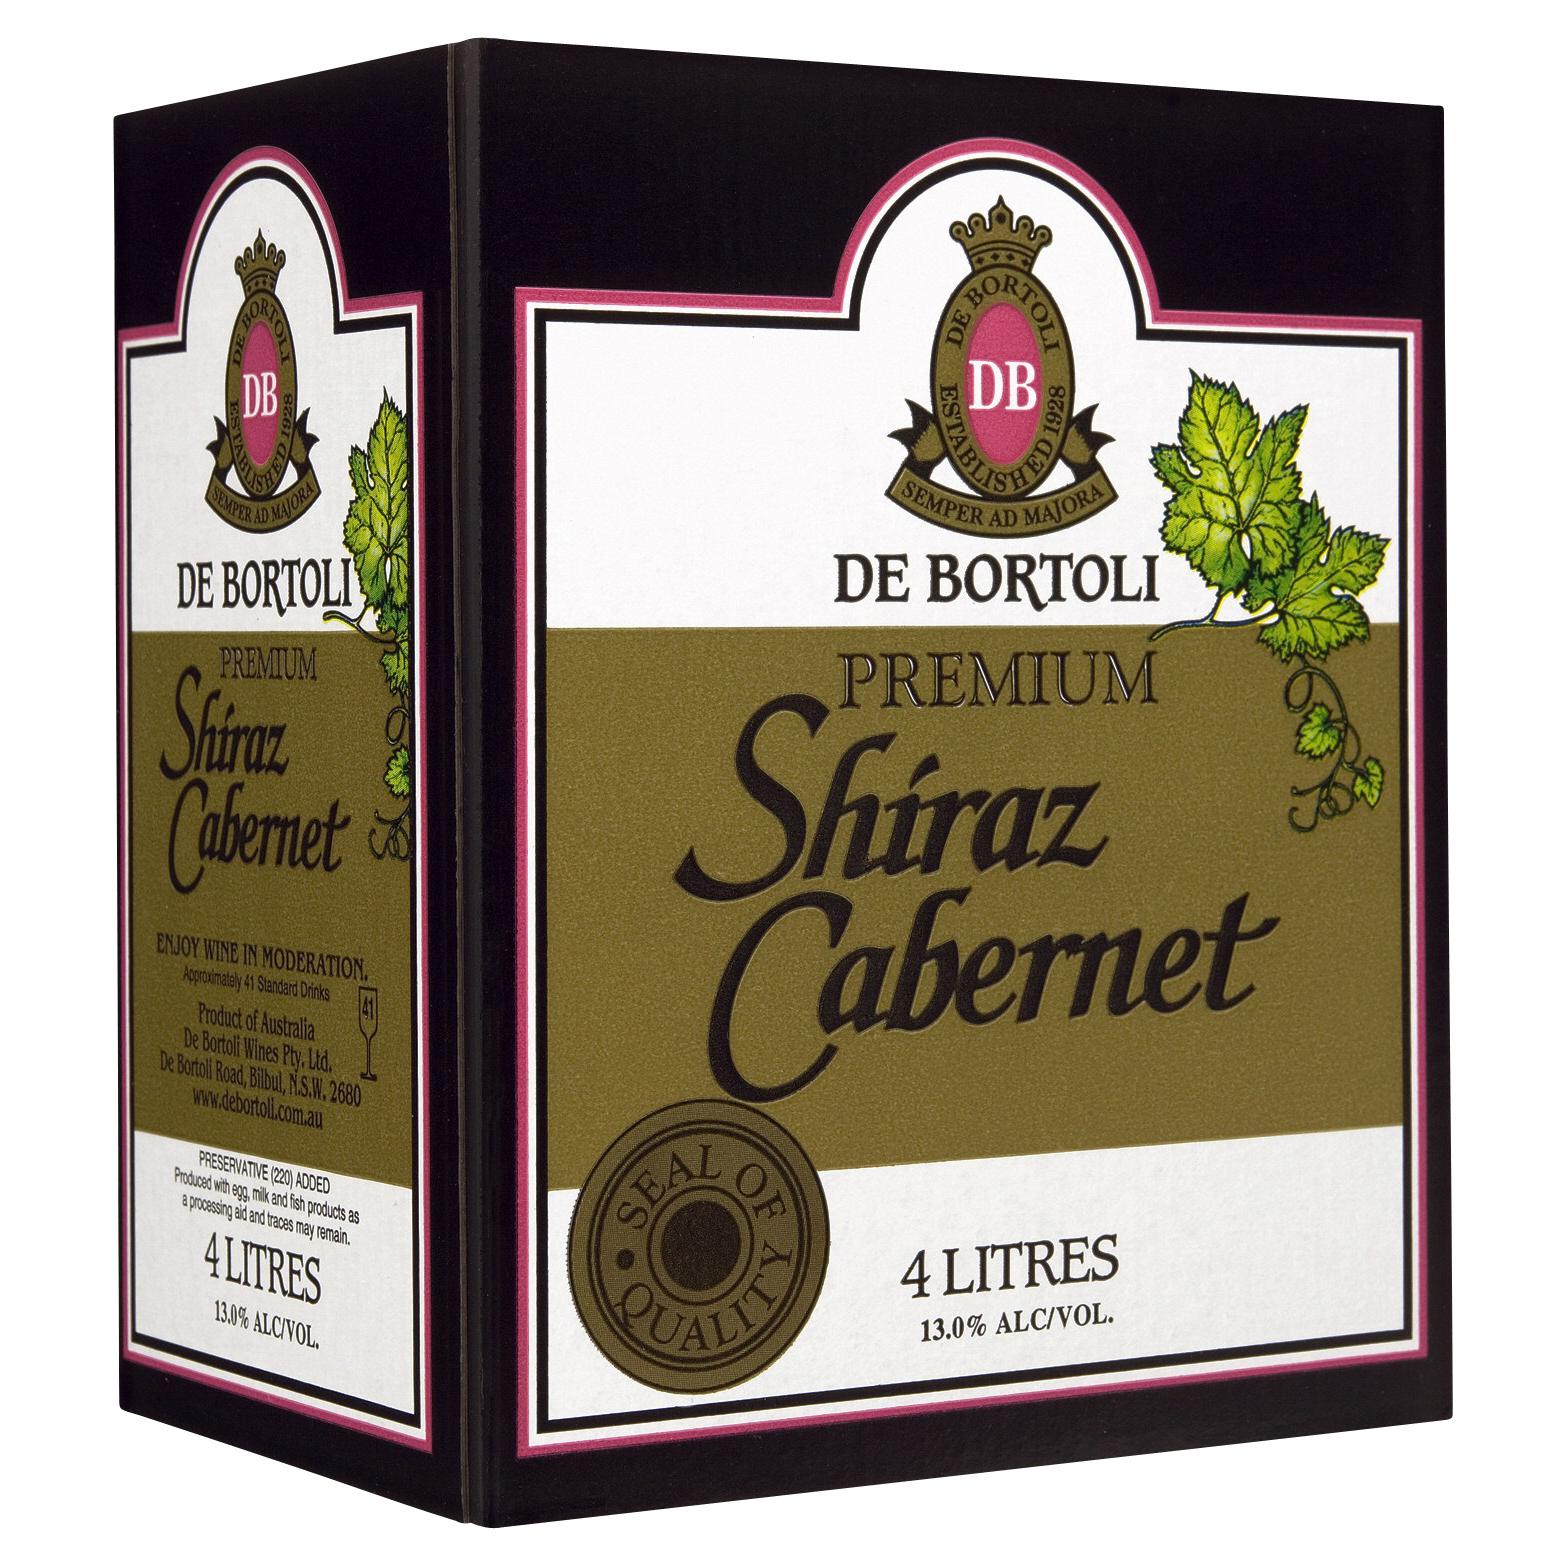 DE BORTOLI PREMIUM SHIRAZ CABERNET WINE CASK